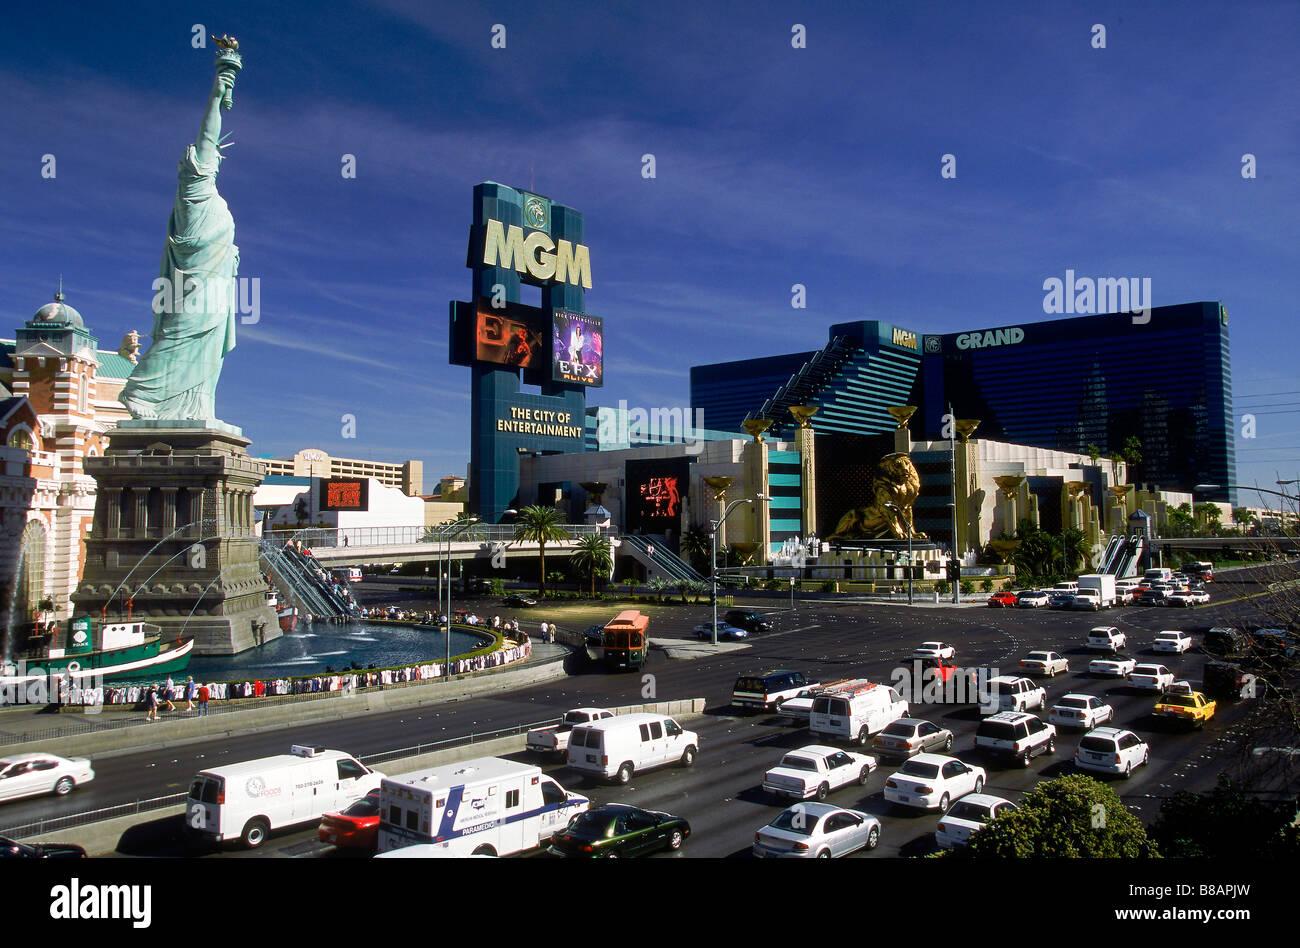 New York New York  MGM Grand Hotels/Casino, Las Vegas, Nevada - Stock Image